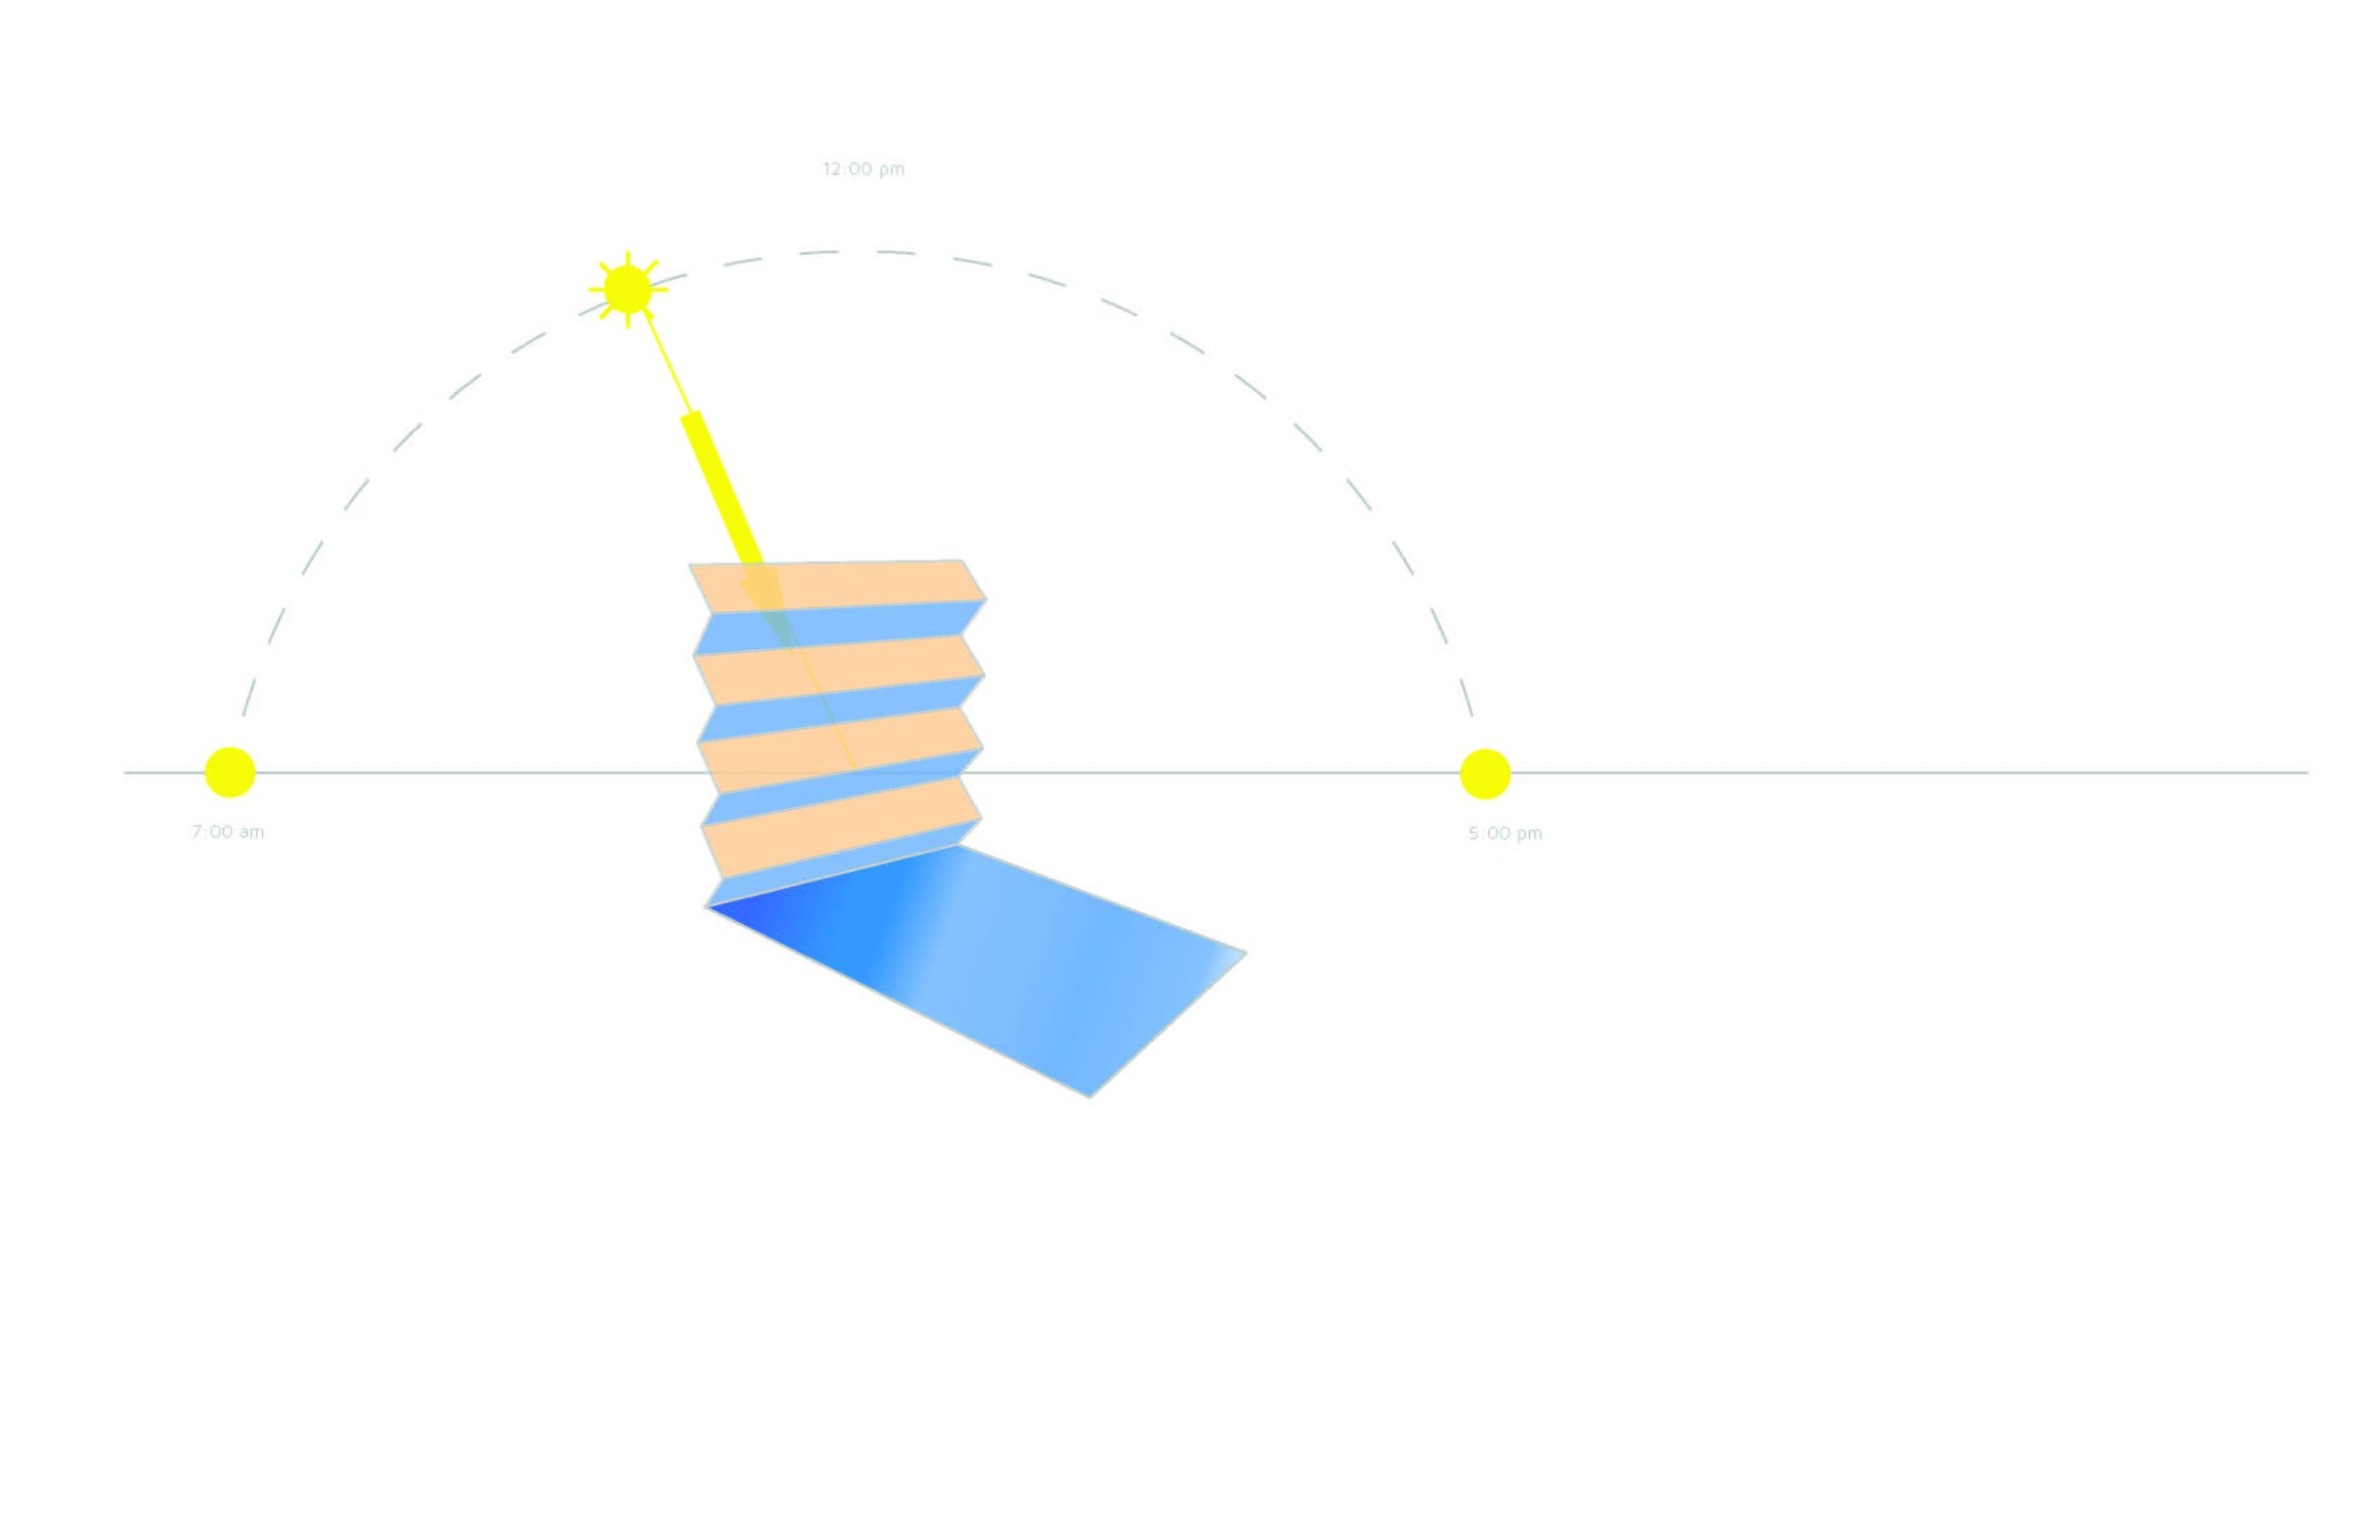 thesis_sun_diagram.jpg